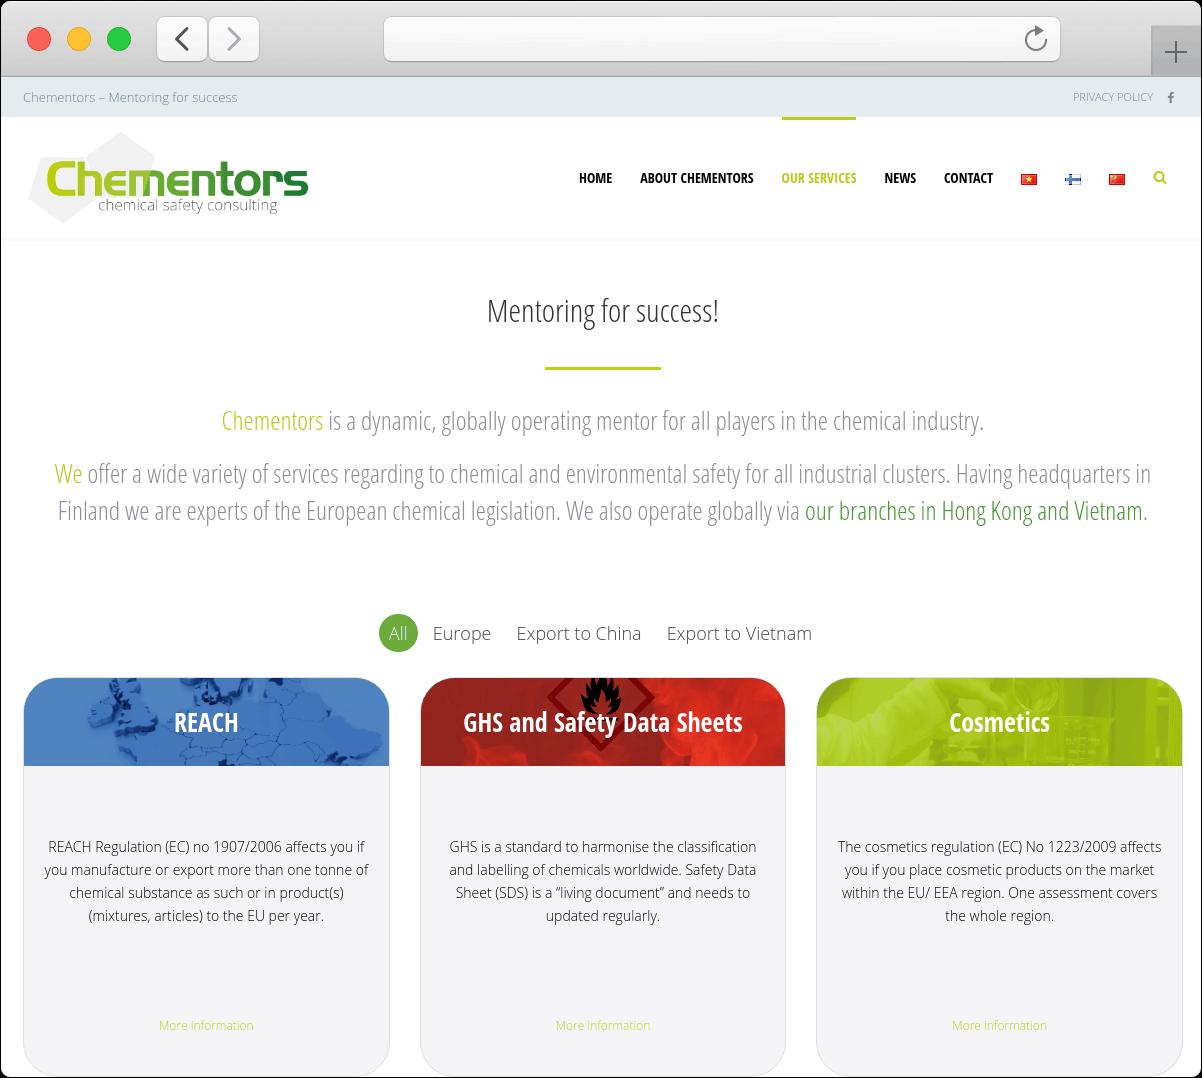 Ultimate Index Study Case chementors.com